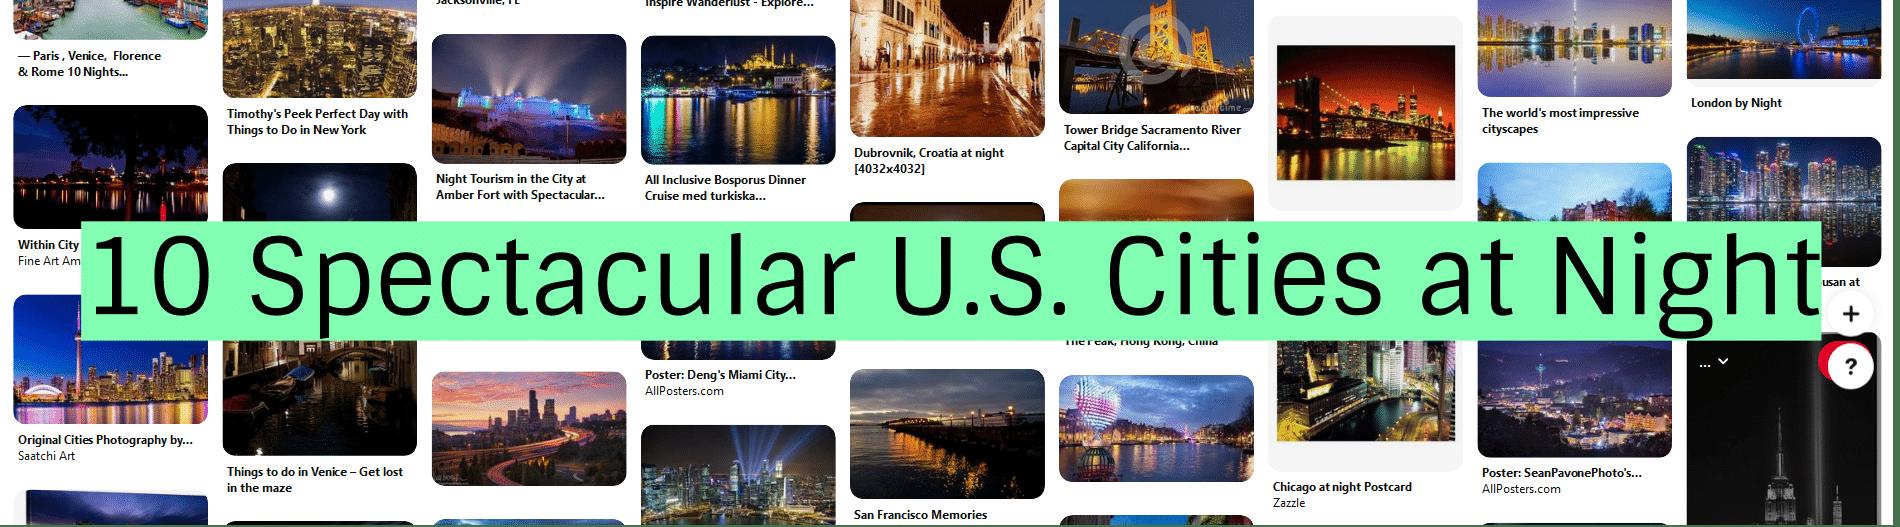 10 Spectacular U.S. Cities at Night